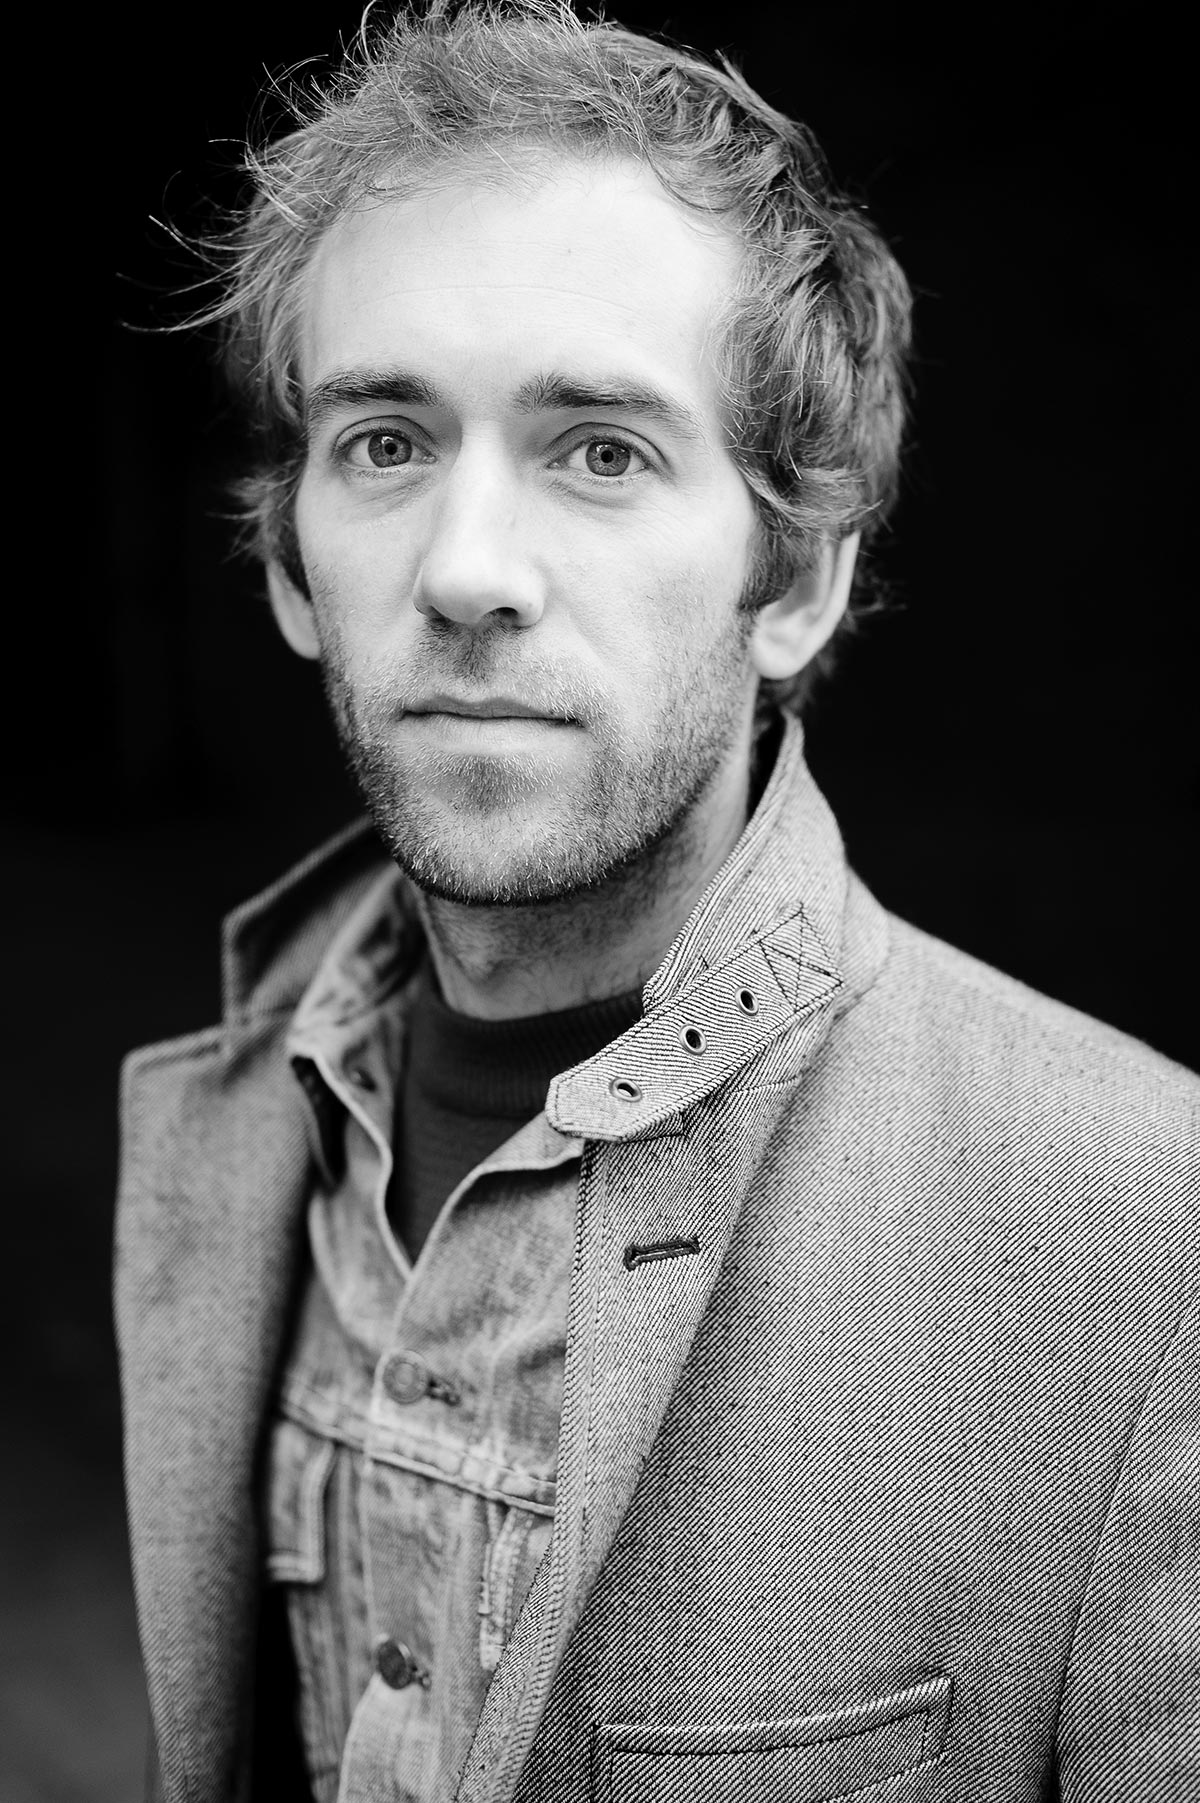 Mathias Delplanque